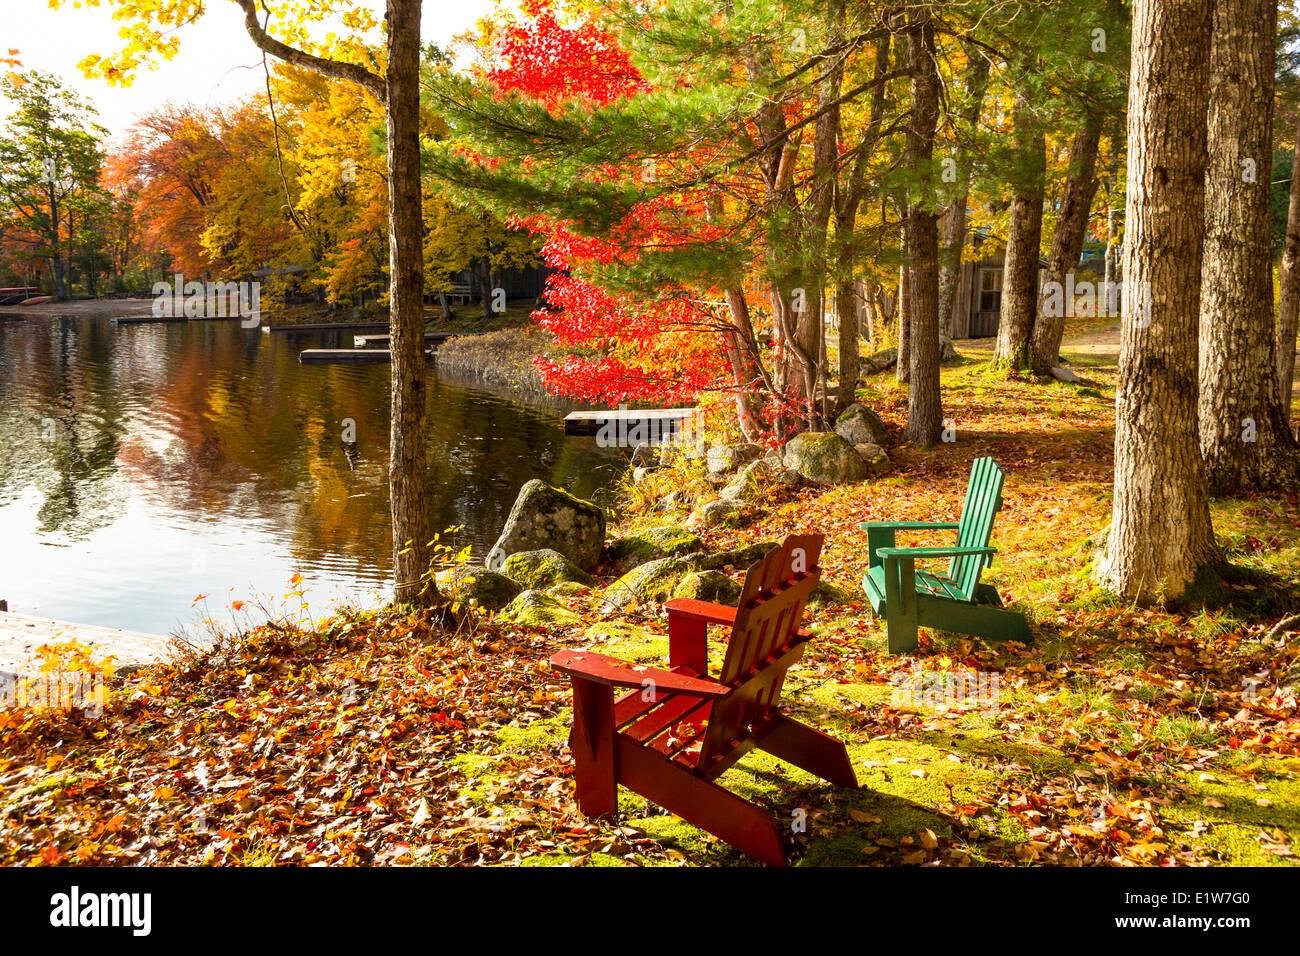 Milford House Cabins, Geier Lake, South Milford, Annapolis County, Nova Scotia, Canada - Stock Image